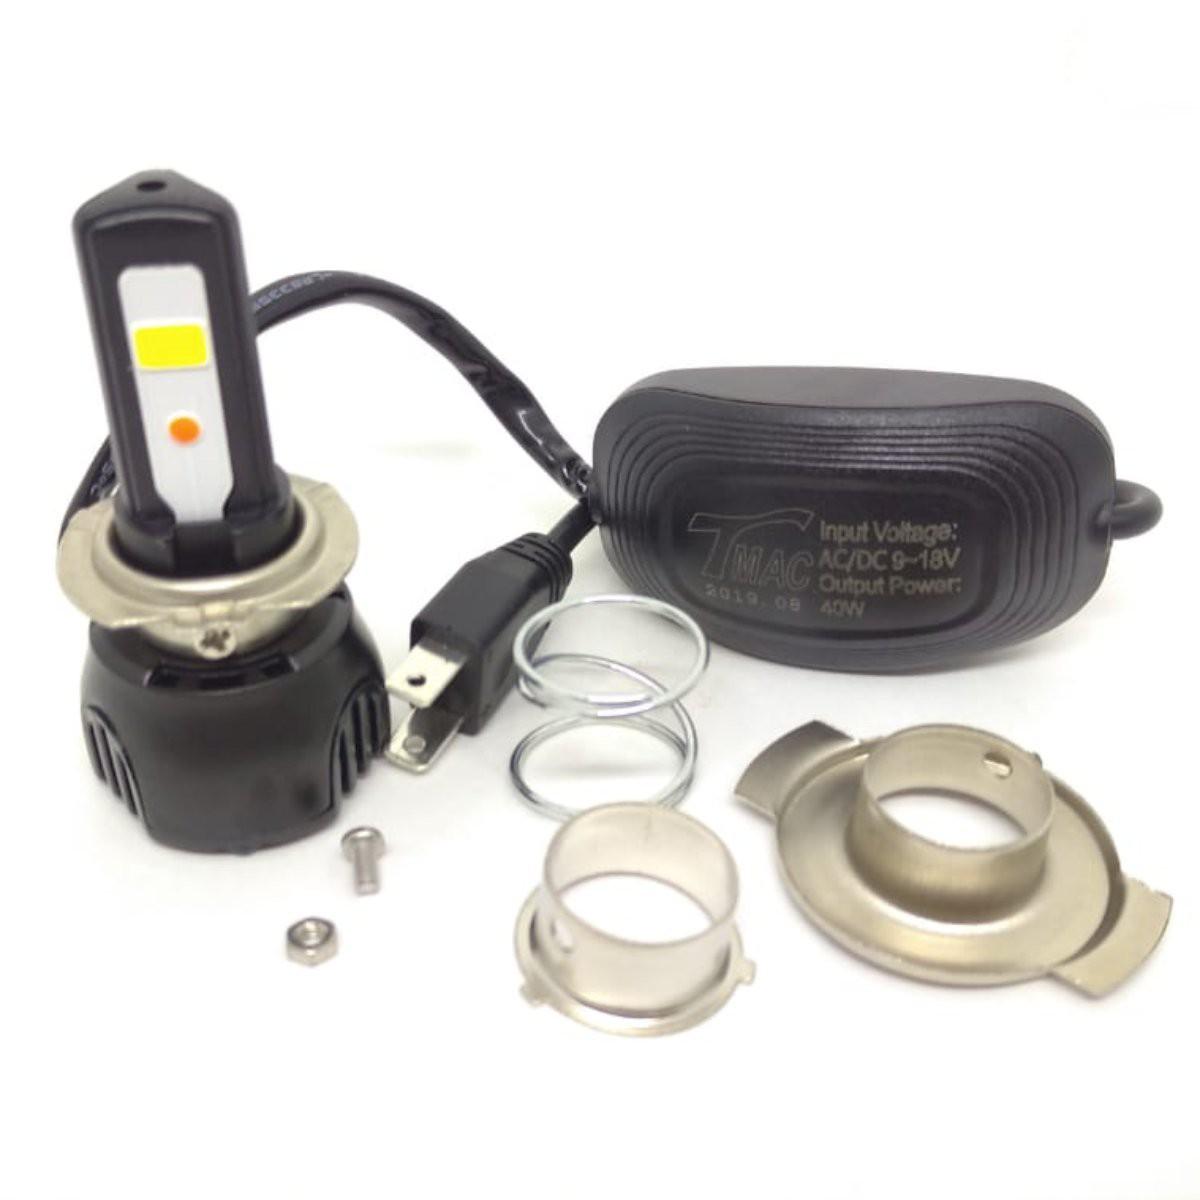 LAMPADA DE LED TMAC FAROL H7 [40W] 3 LEDs 4400 LUMENS C/ REATOR LED011